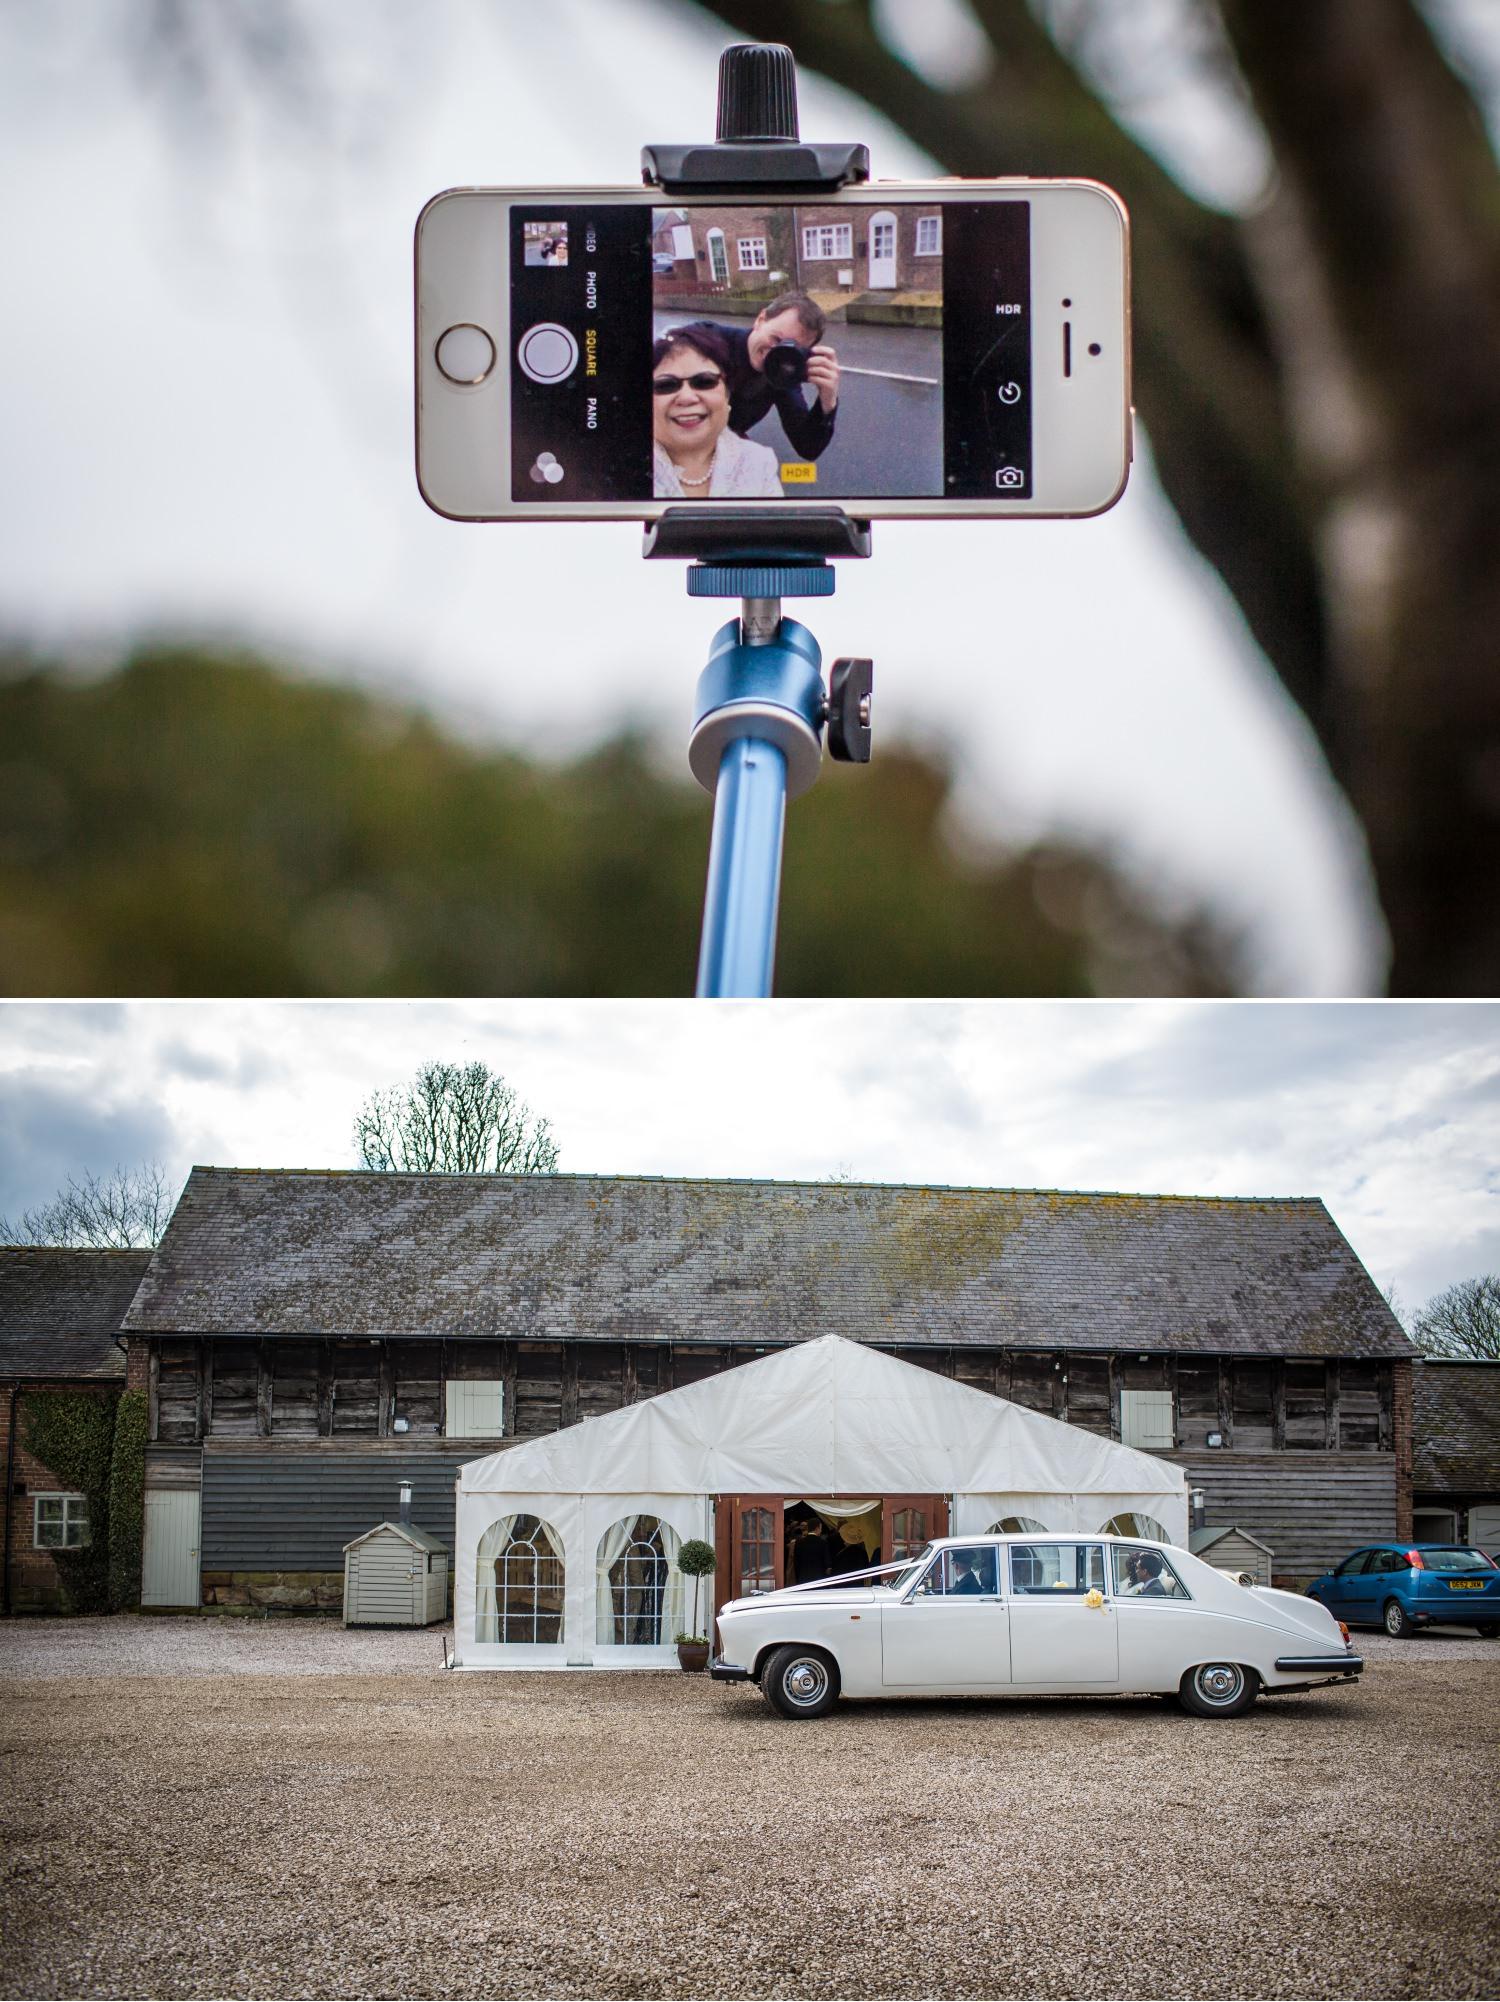 Wedding Photograph of wedding car at Pimhill Barn, Shropshire